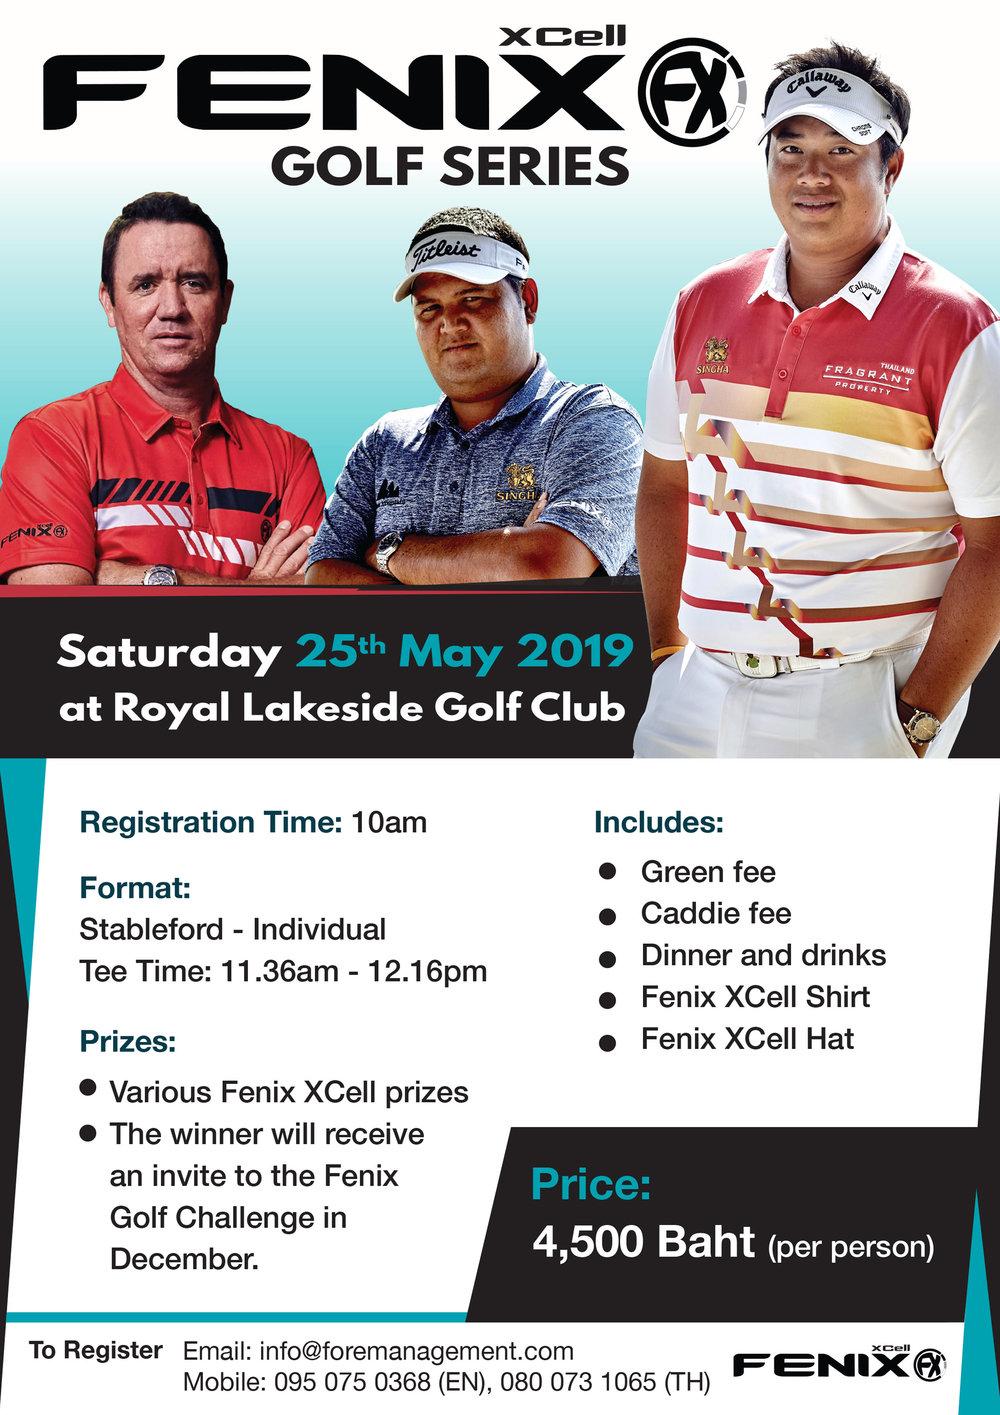 Fenix golf series_Poster.jpg